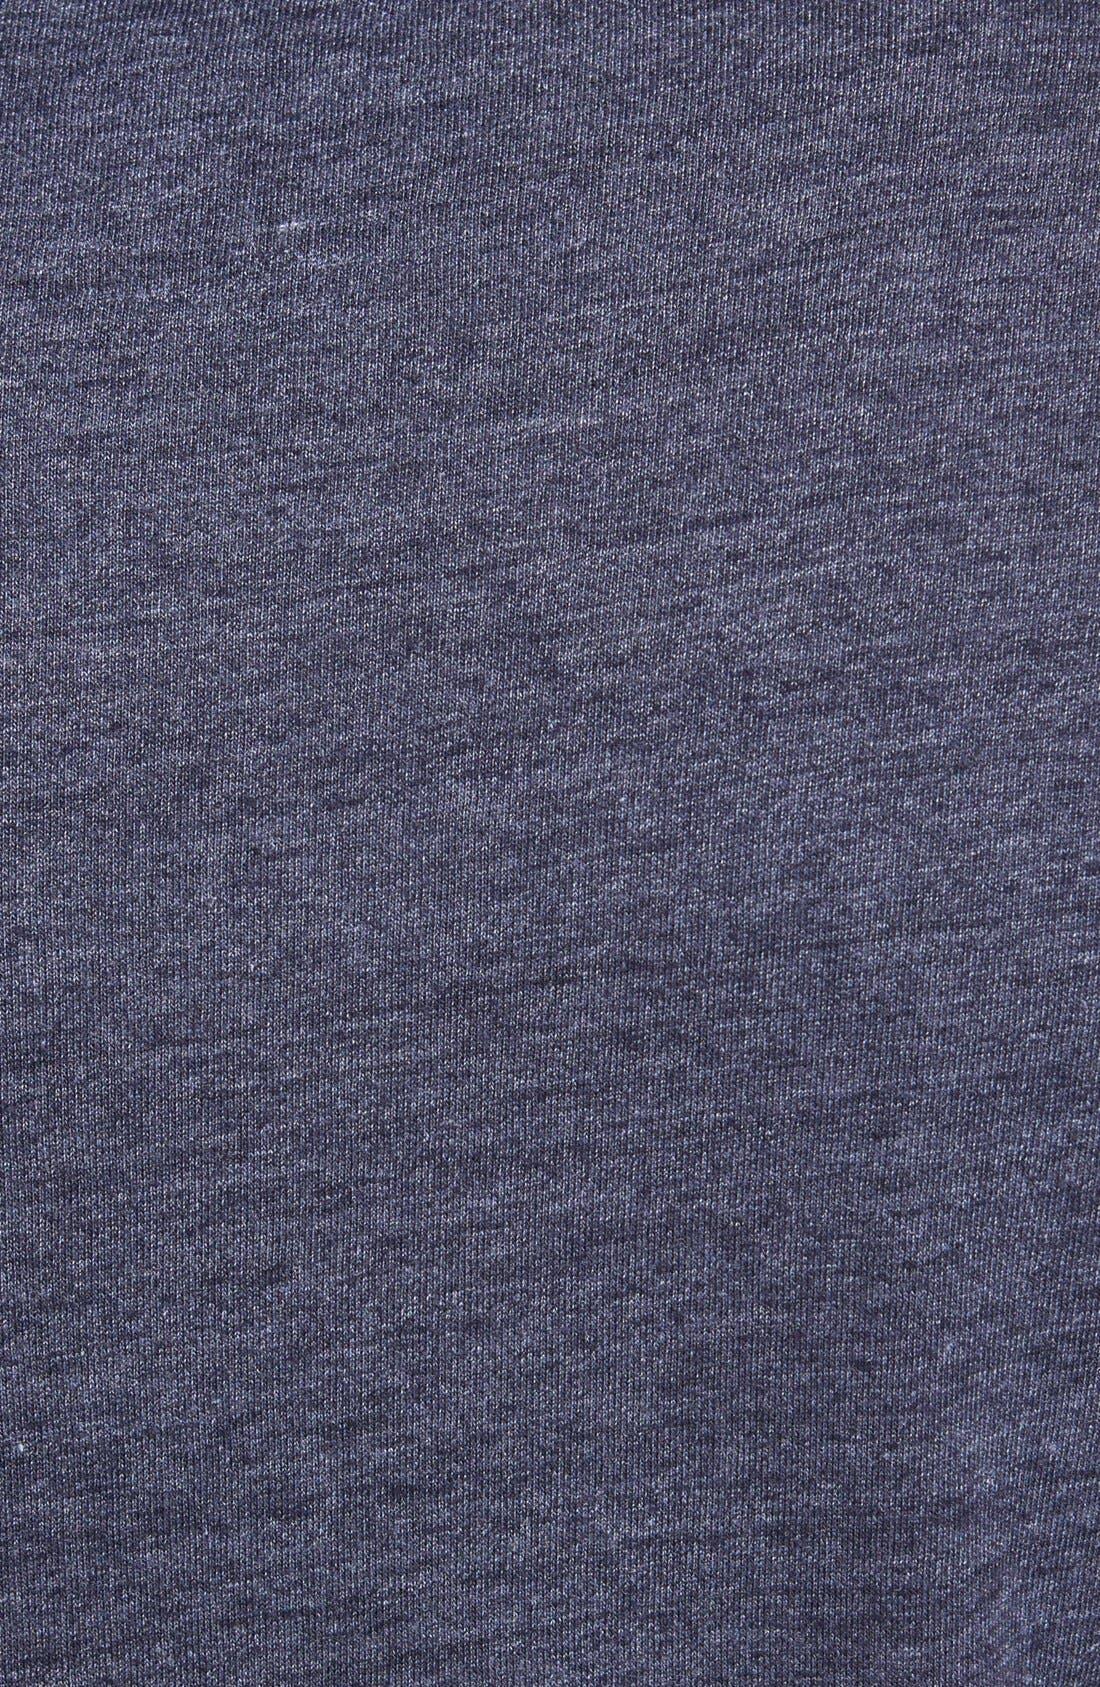 Alternate Image 3  - Original Penguin 'Five O'Clock' Graphic T-Shirt